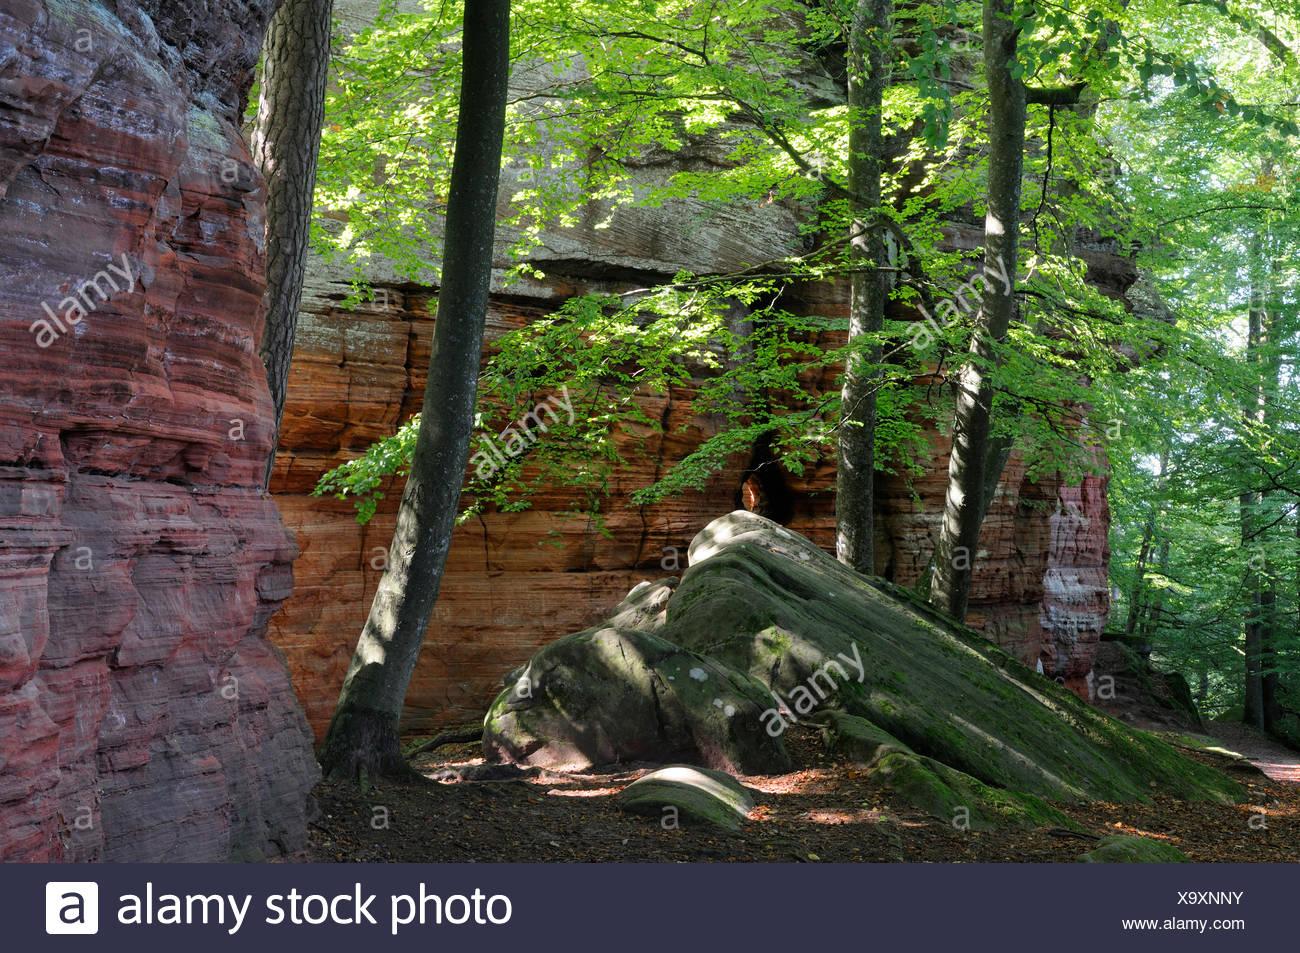 Sandstone rocks Alignment - Palatinate Forest Germany Altschlossfelsen - Stock Image